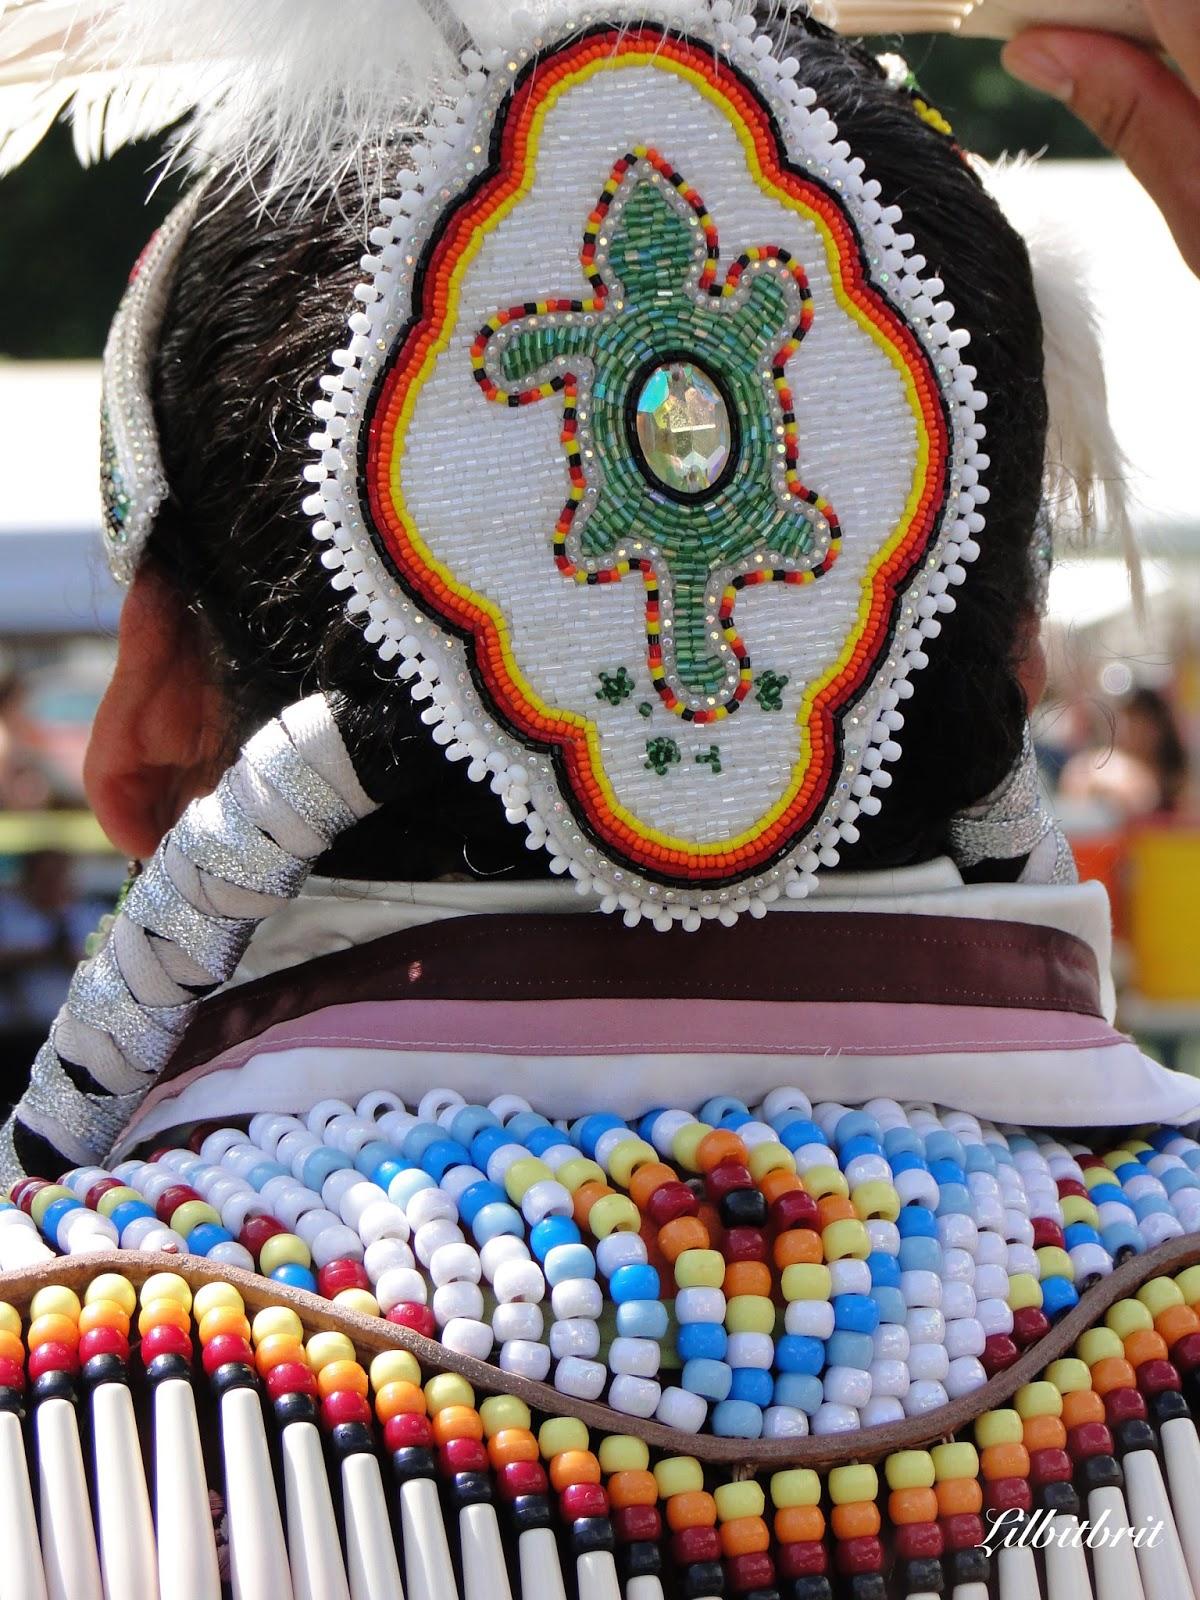 lilbitbrit roasting ears of corn festival american indian festival